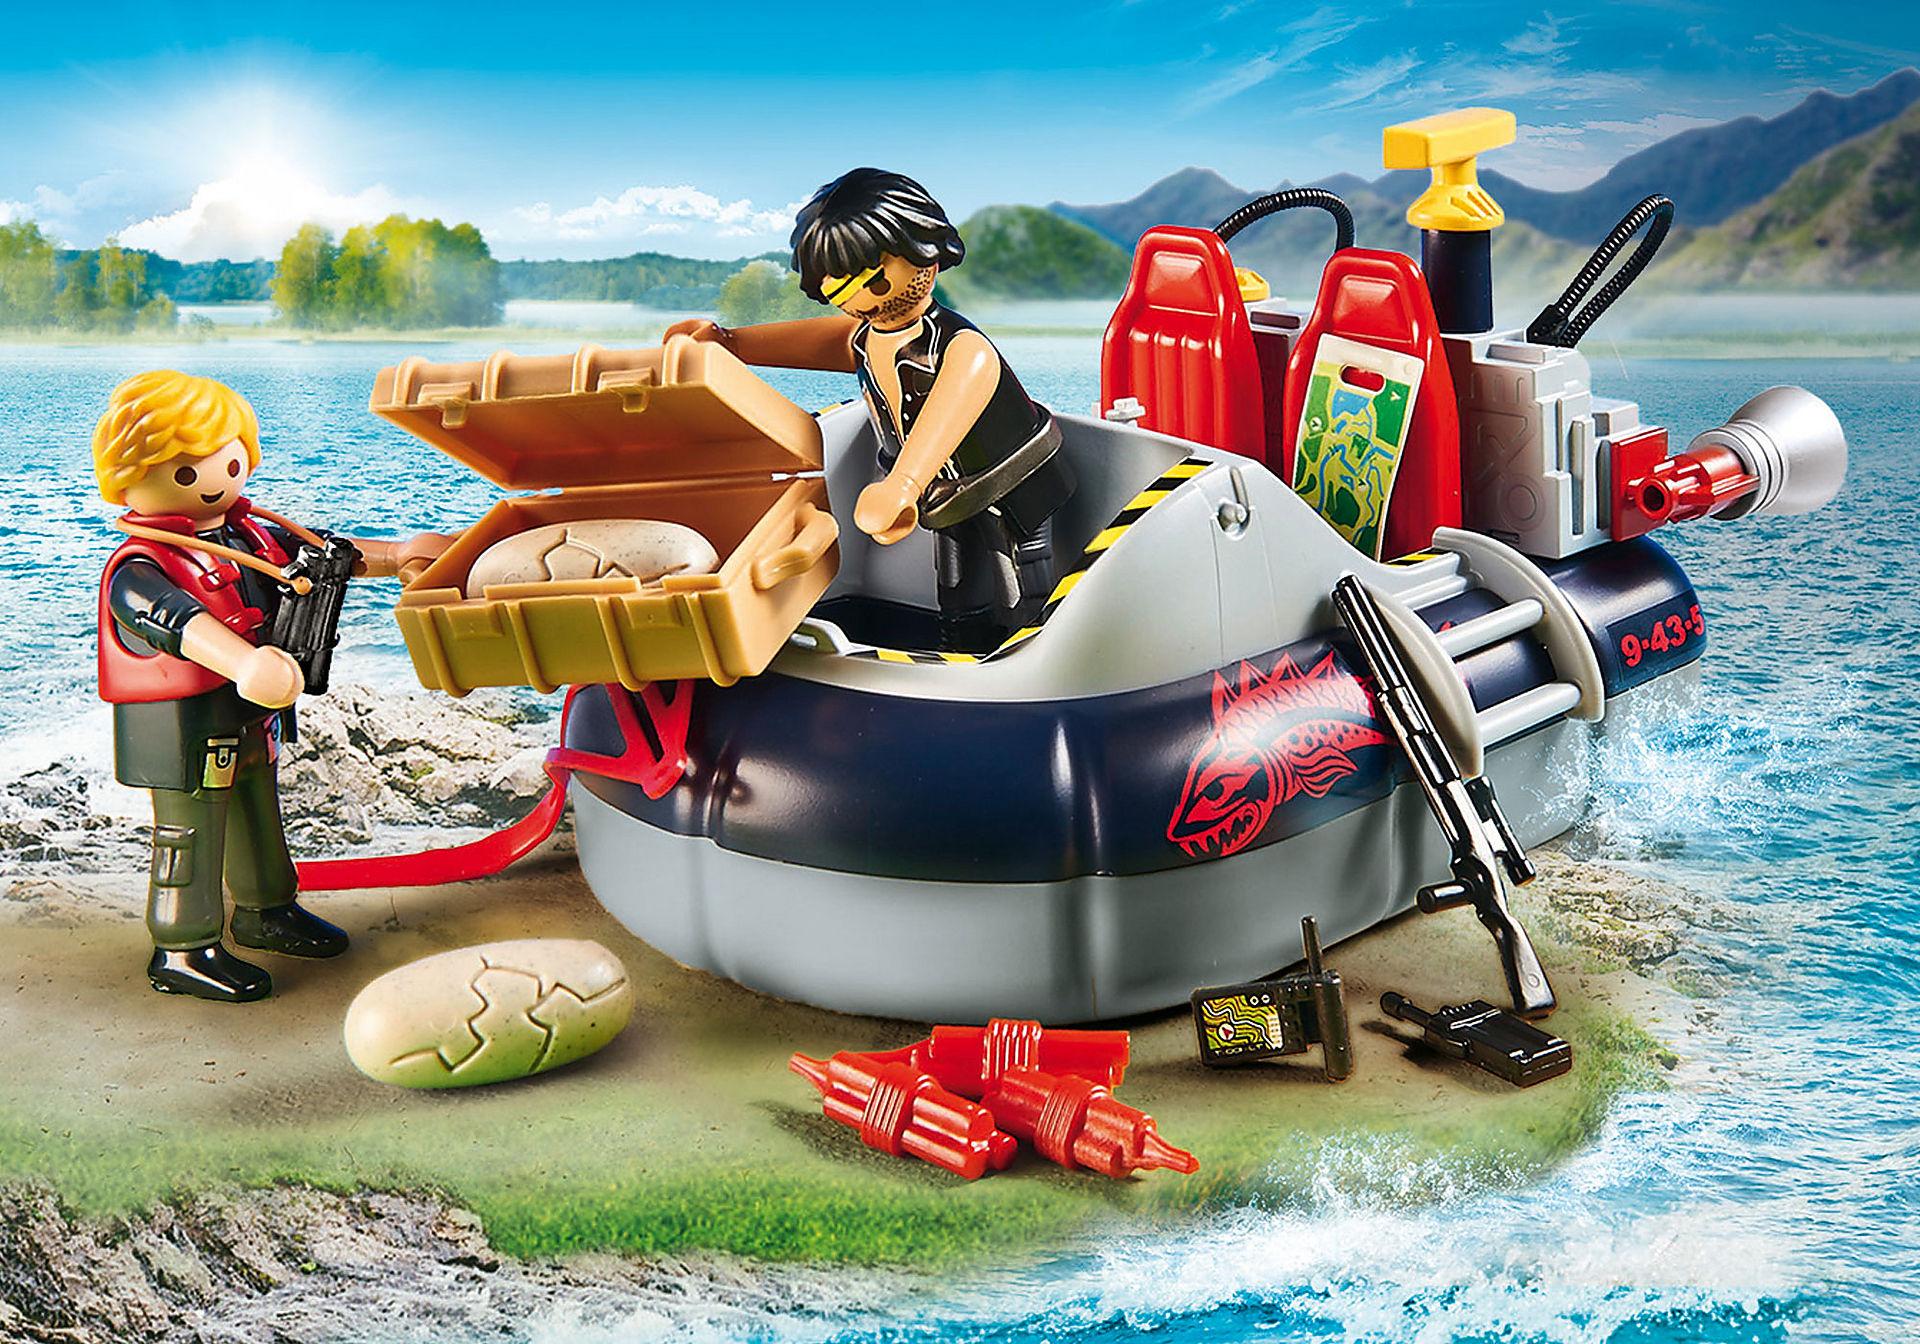 http://media.playmobil.com/i/playmobil/9435_product_extra2/Luftkissenboot mit Unterwassermotor